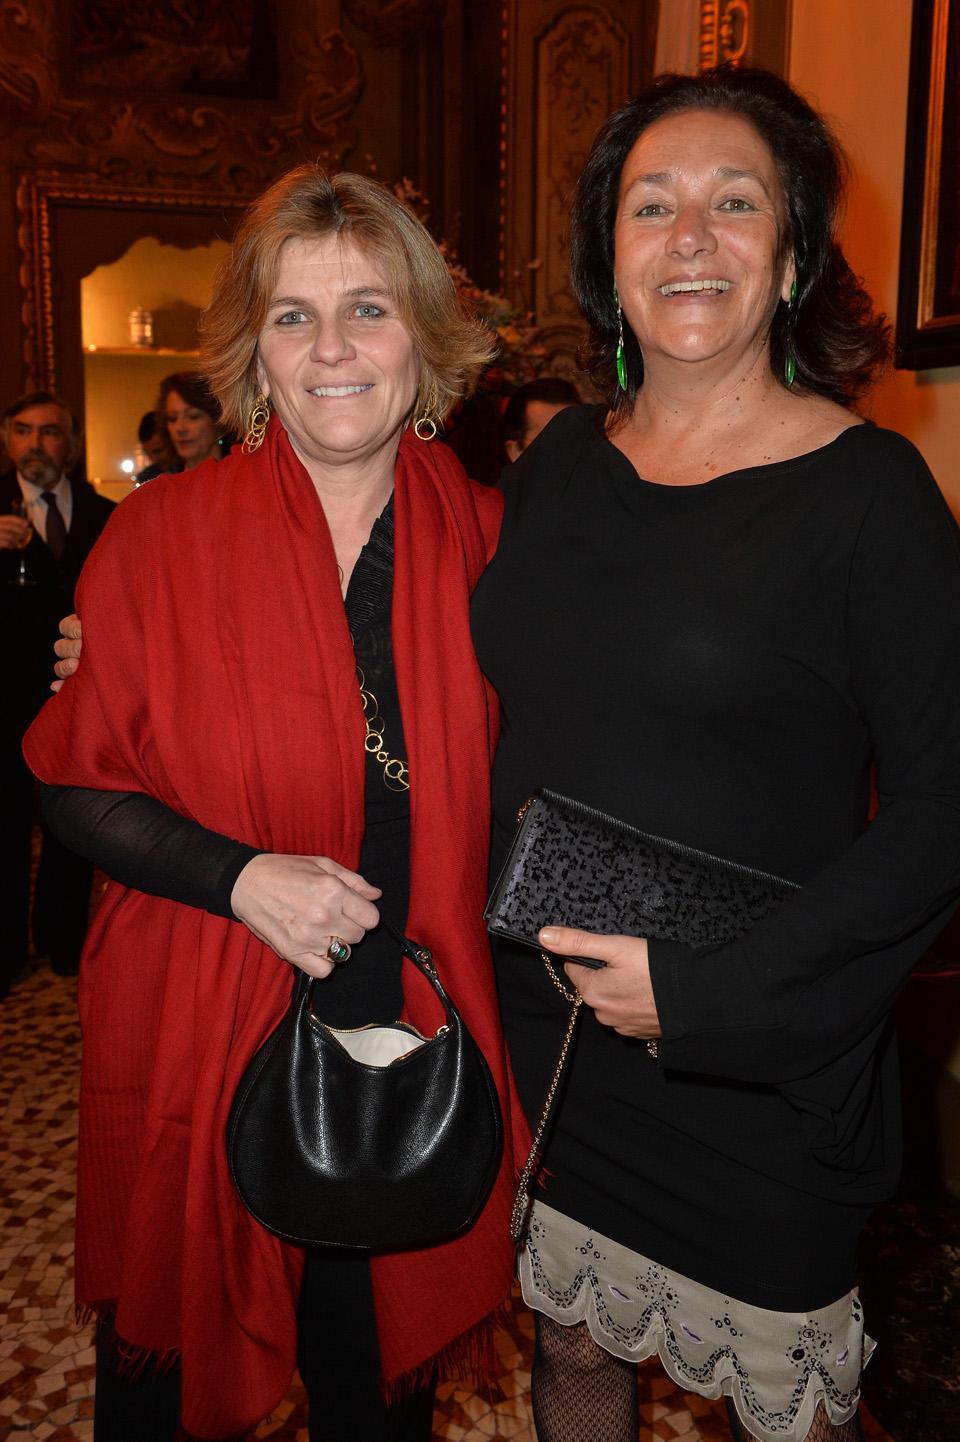 Cristiana Sada & Vannozza Paravicini Crespi